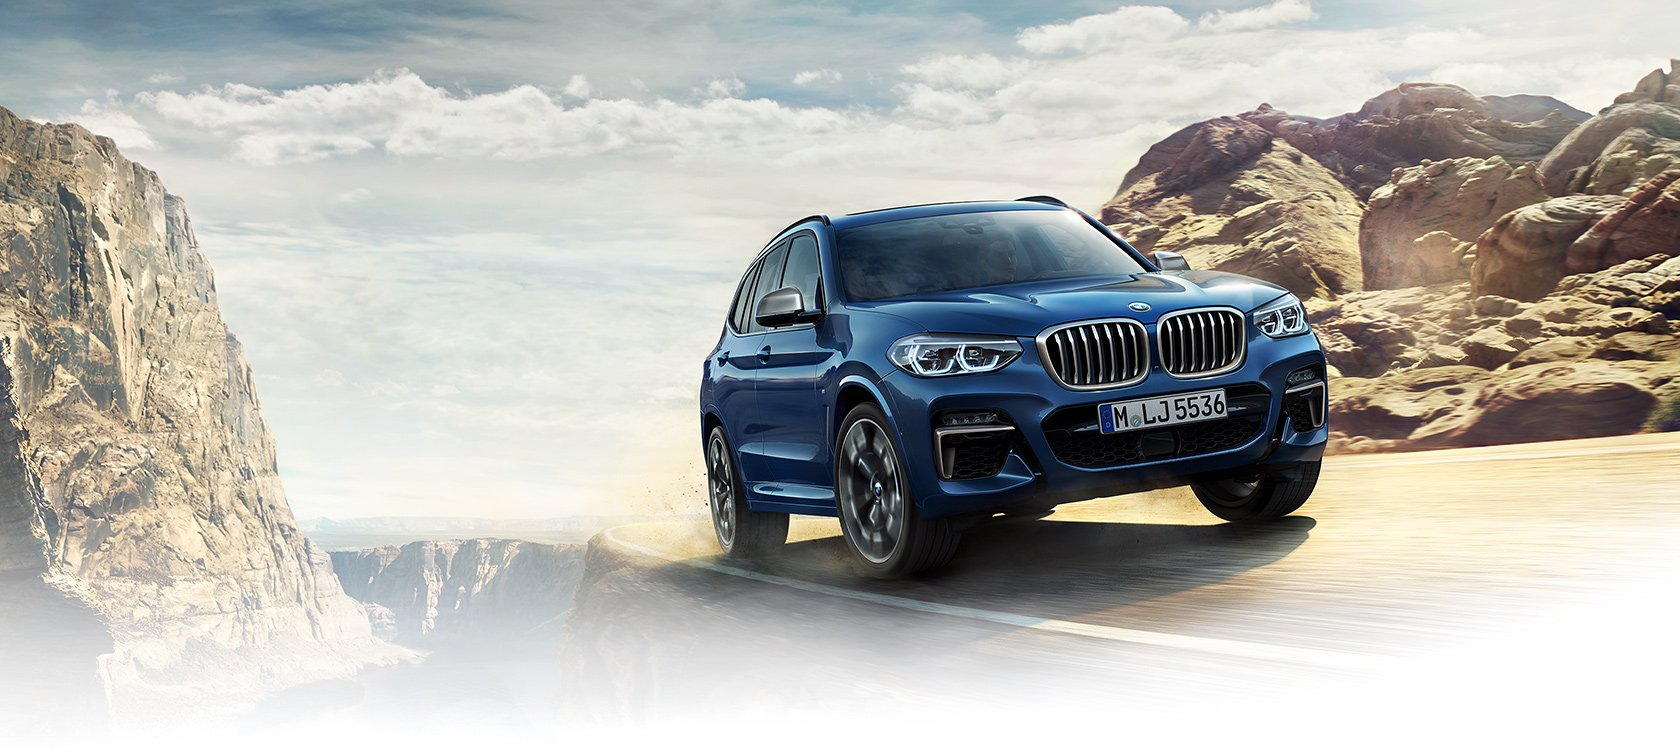 BMW X3 At a glance